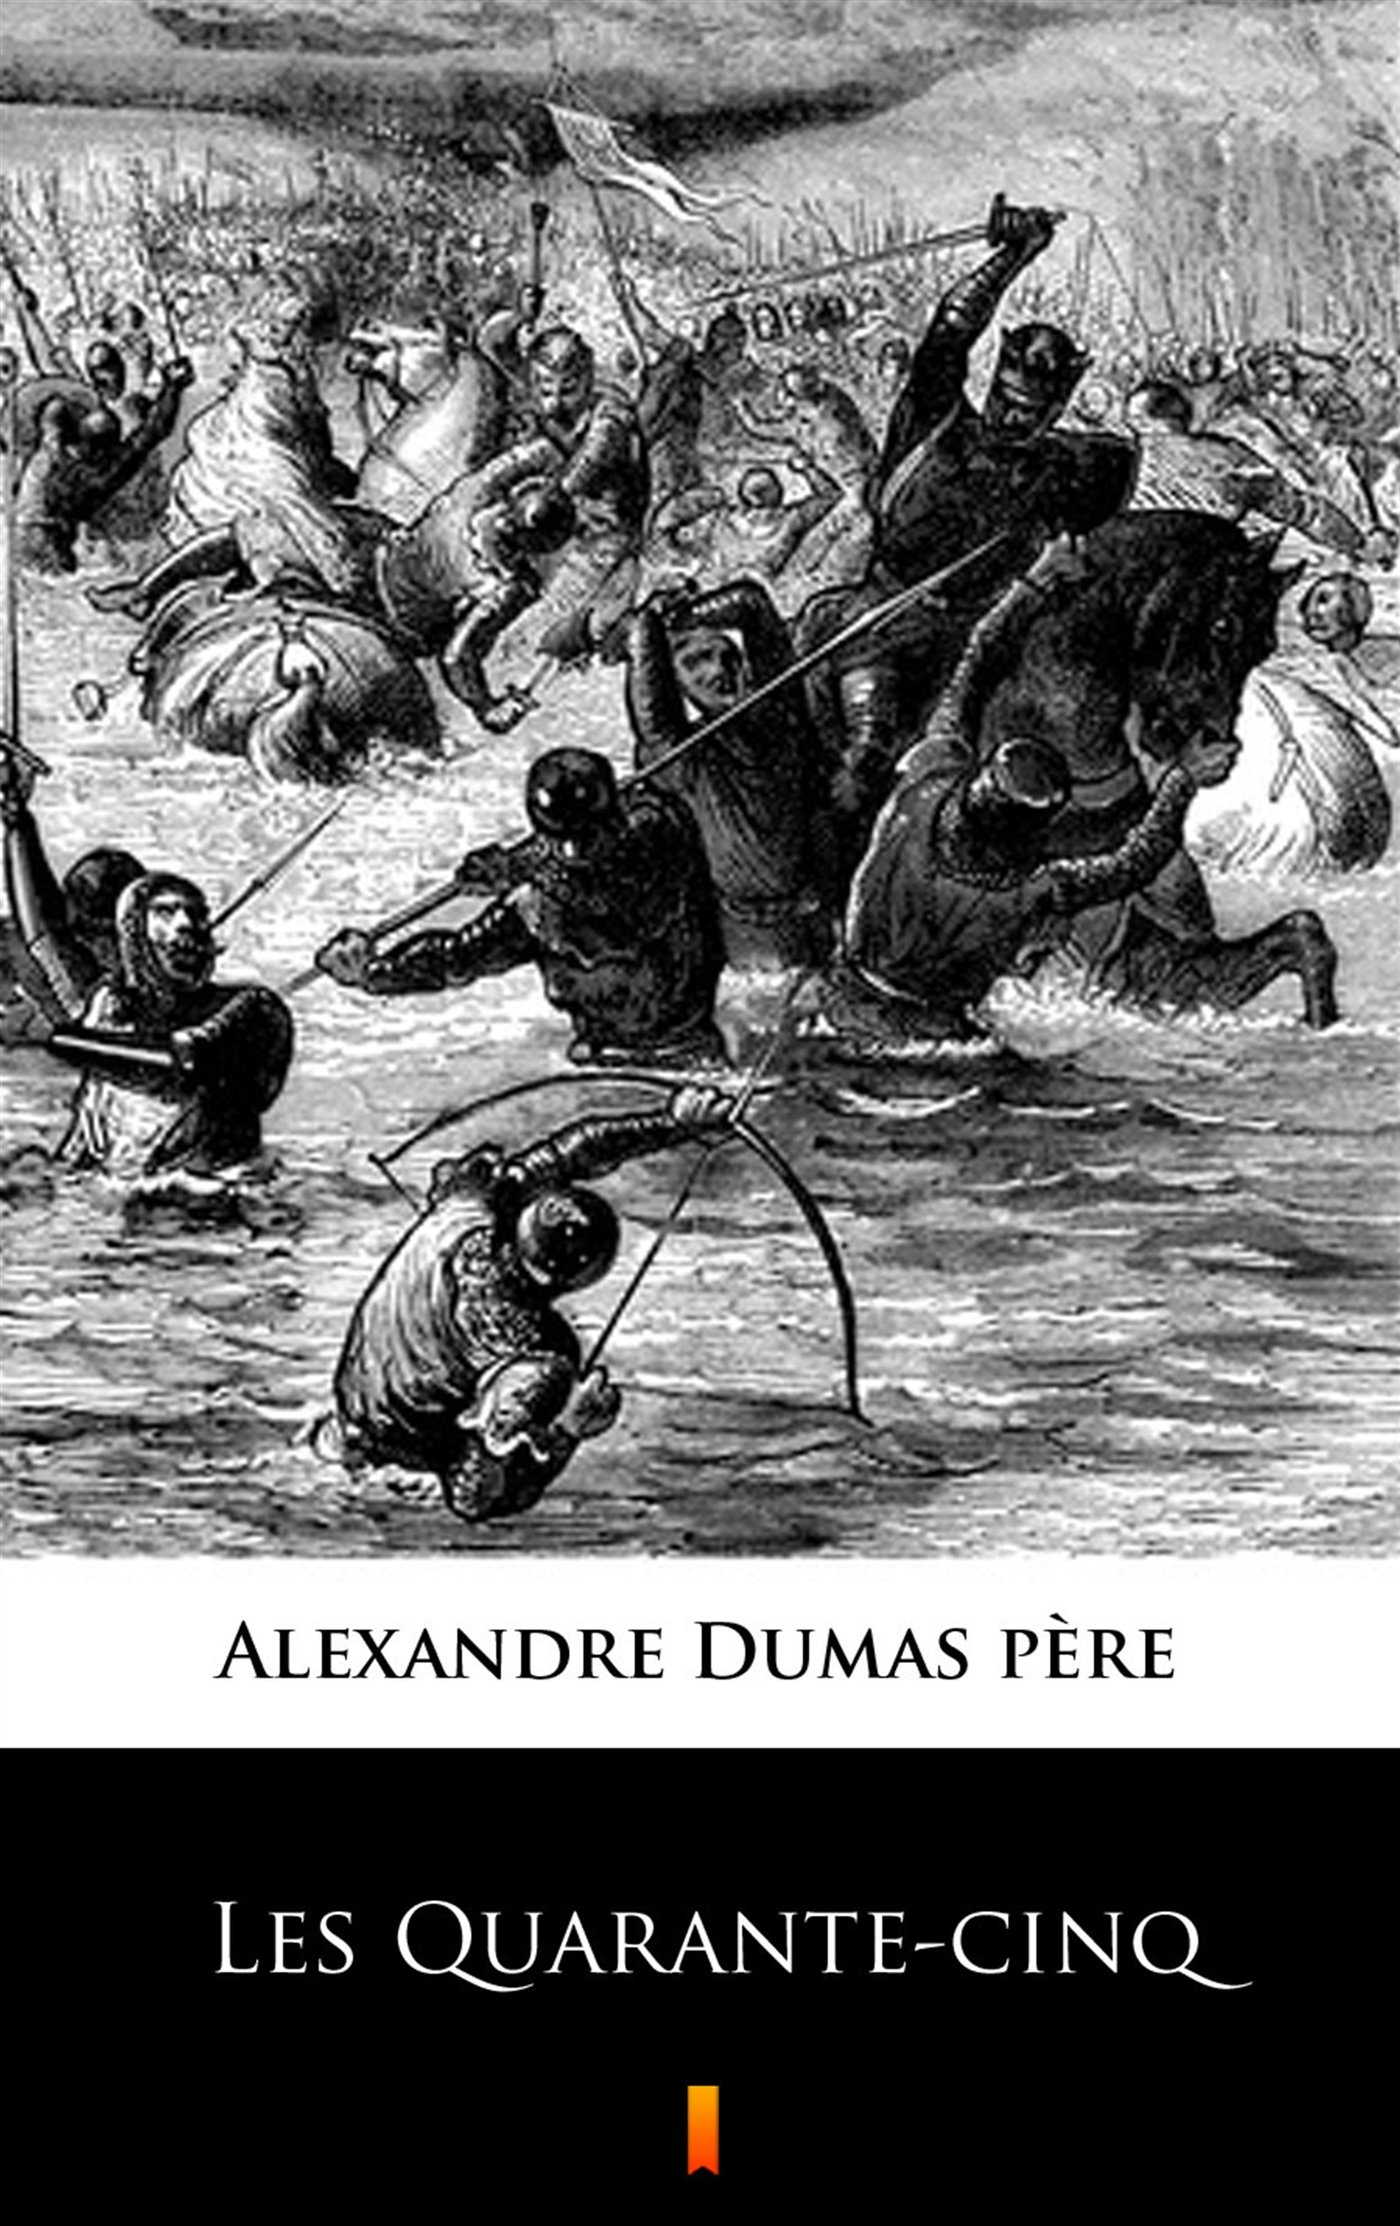 Les Quarante-cinq - Ebook (Książka na Kindle) do pobrania w formacie MOBI